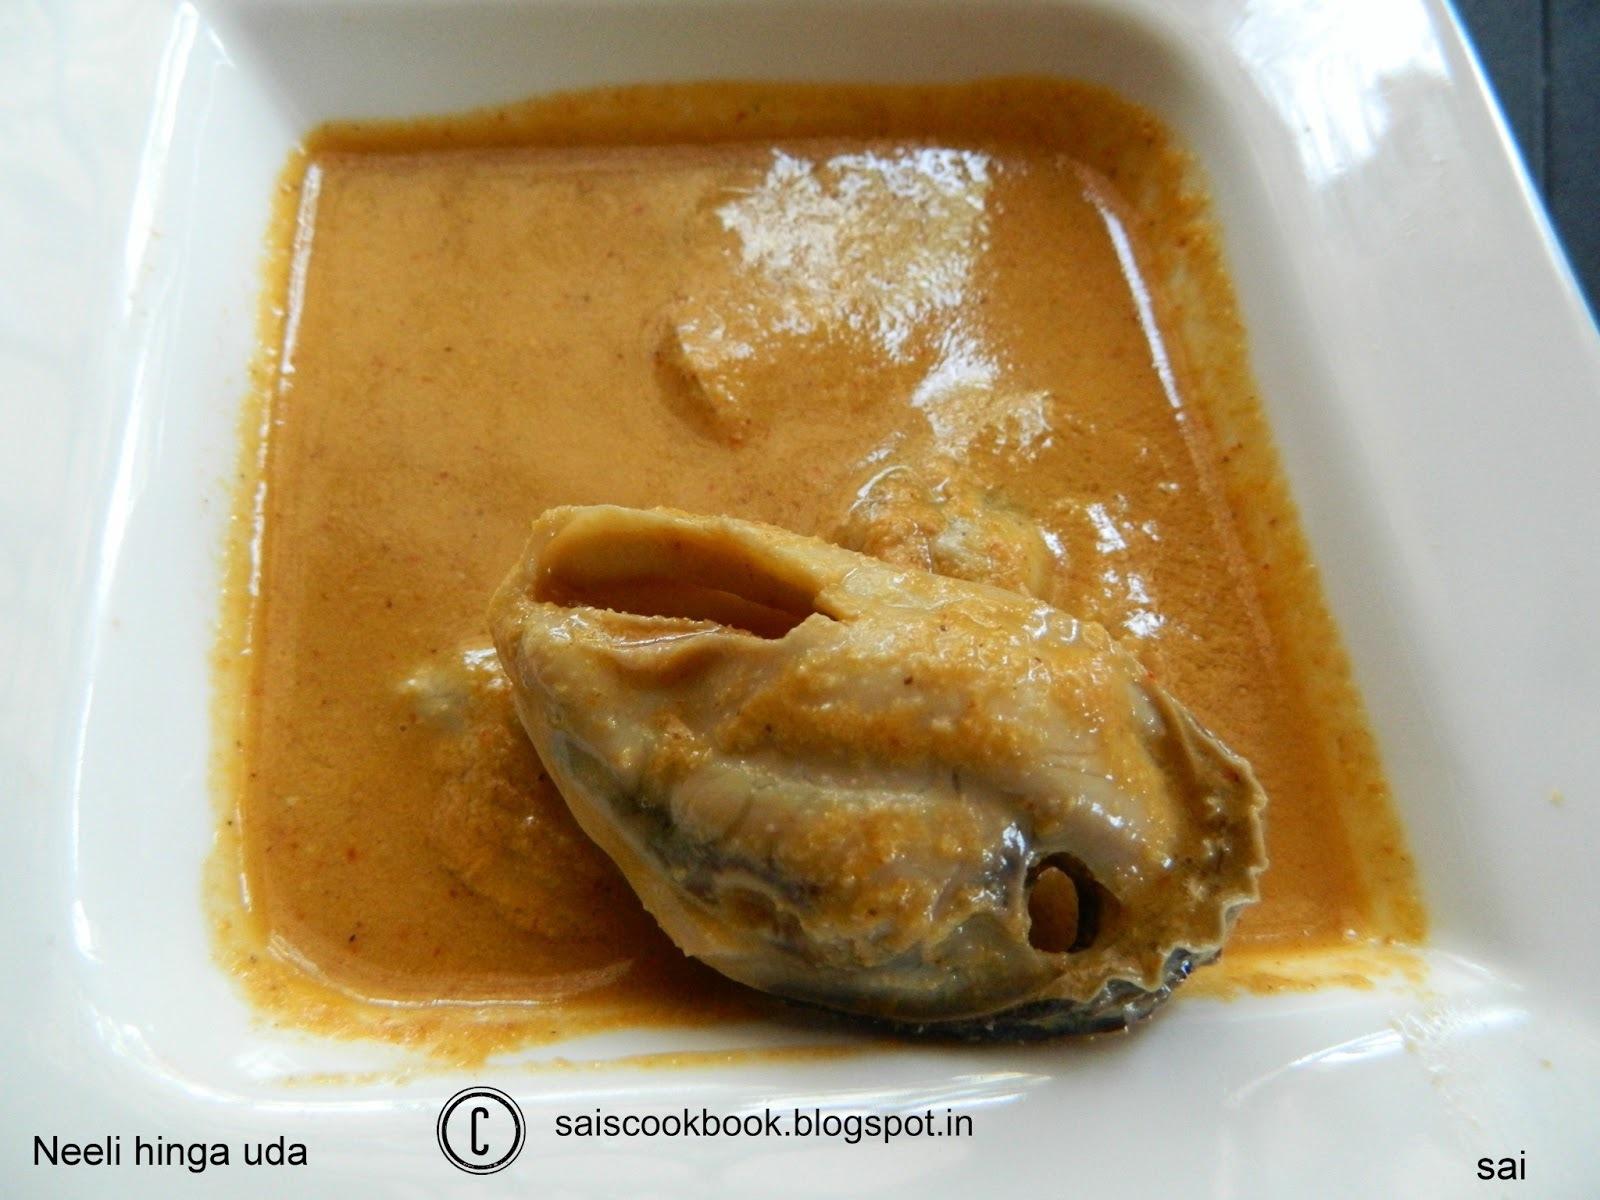 Neeli hinga uda(Mussels in asafoetida sauce)